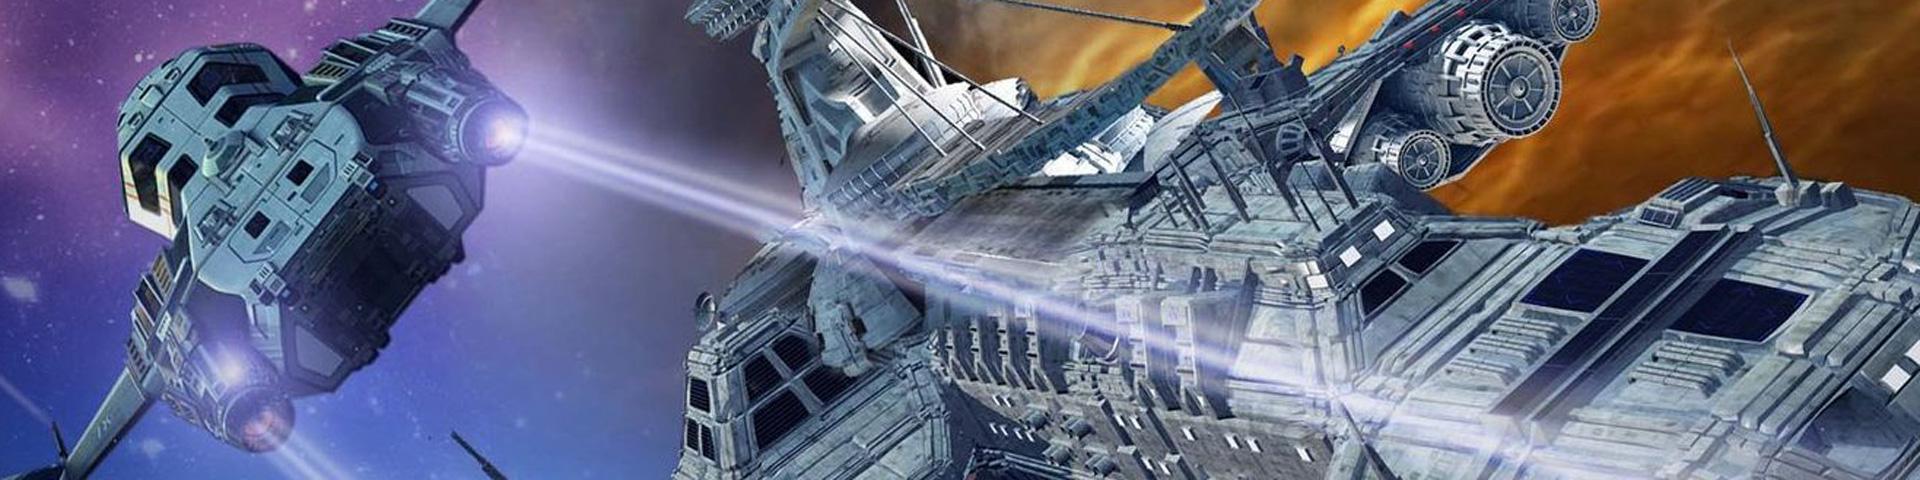 Starships battle in deep space.